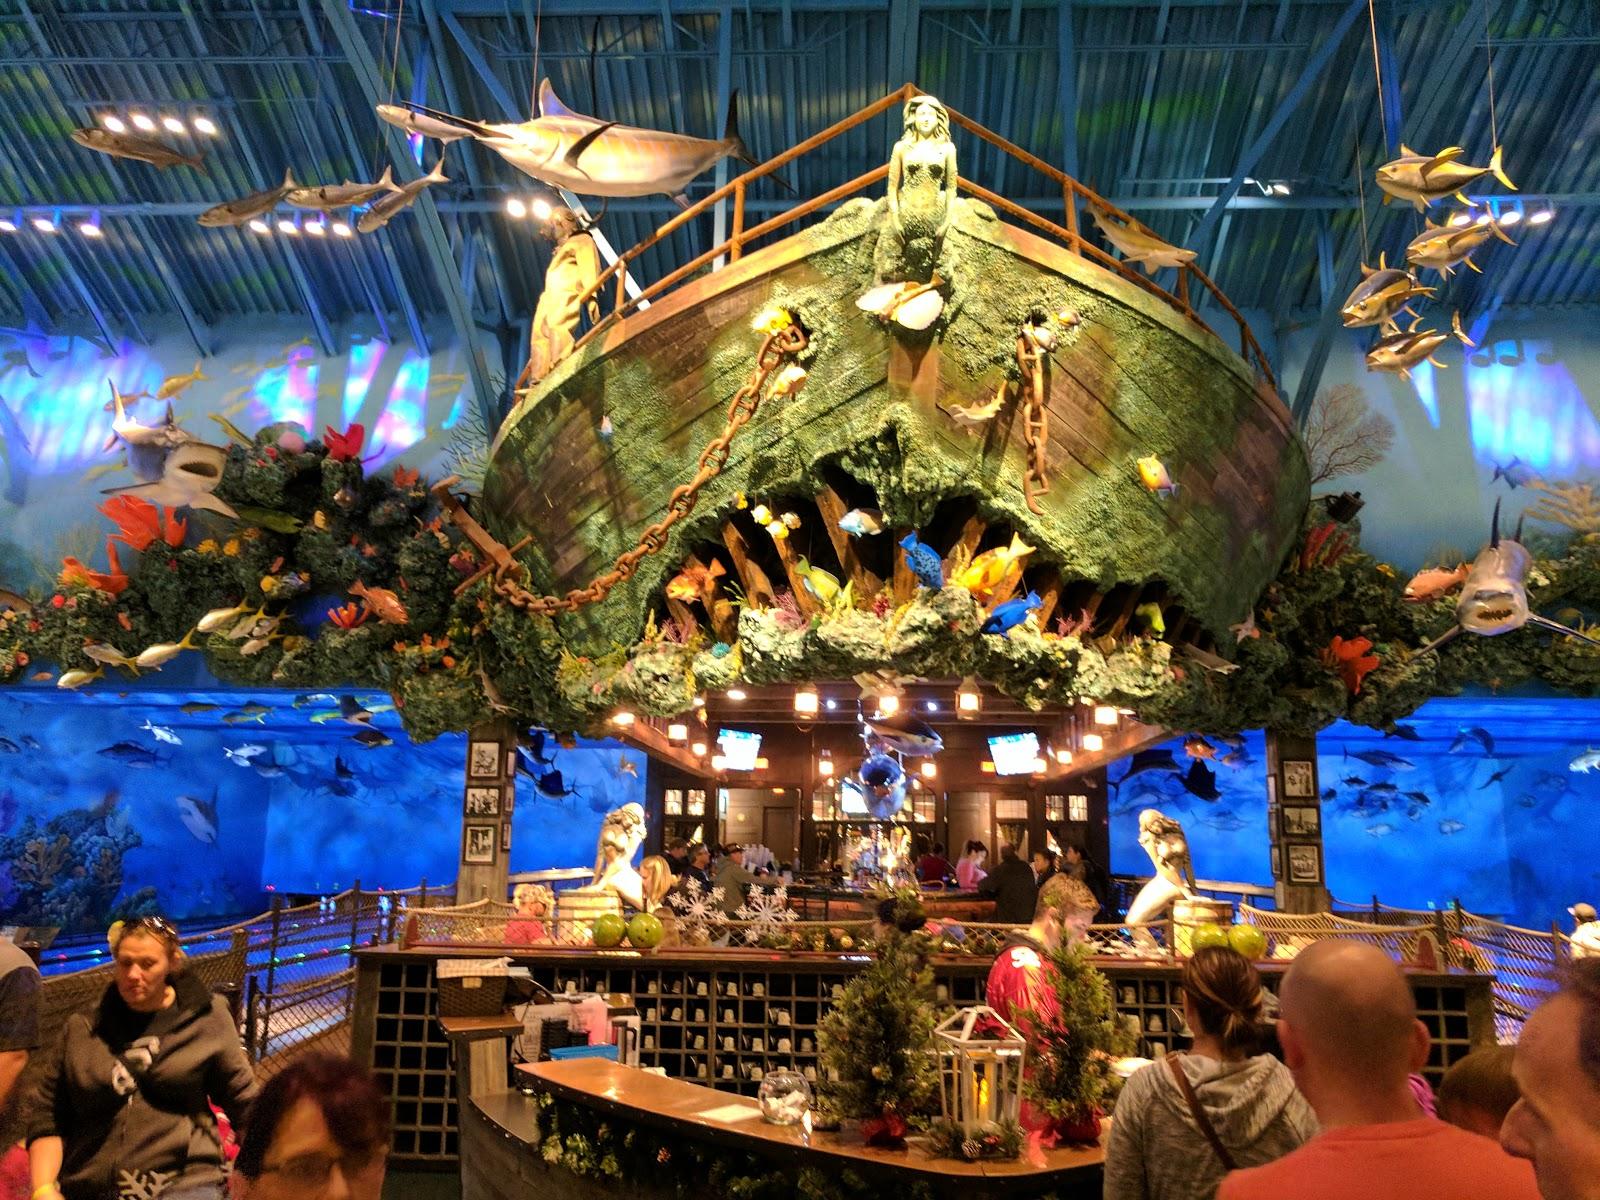 The San Jose Blog: Uncle Buck's Fish Bowl & Grill @ San Jose Bass Pro Shops